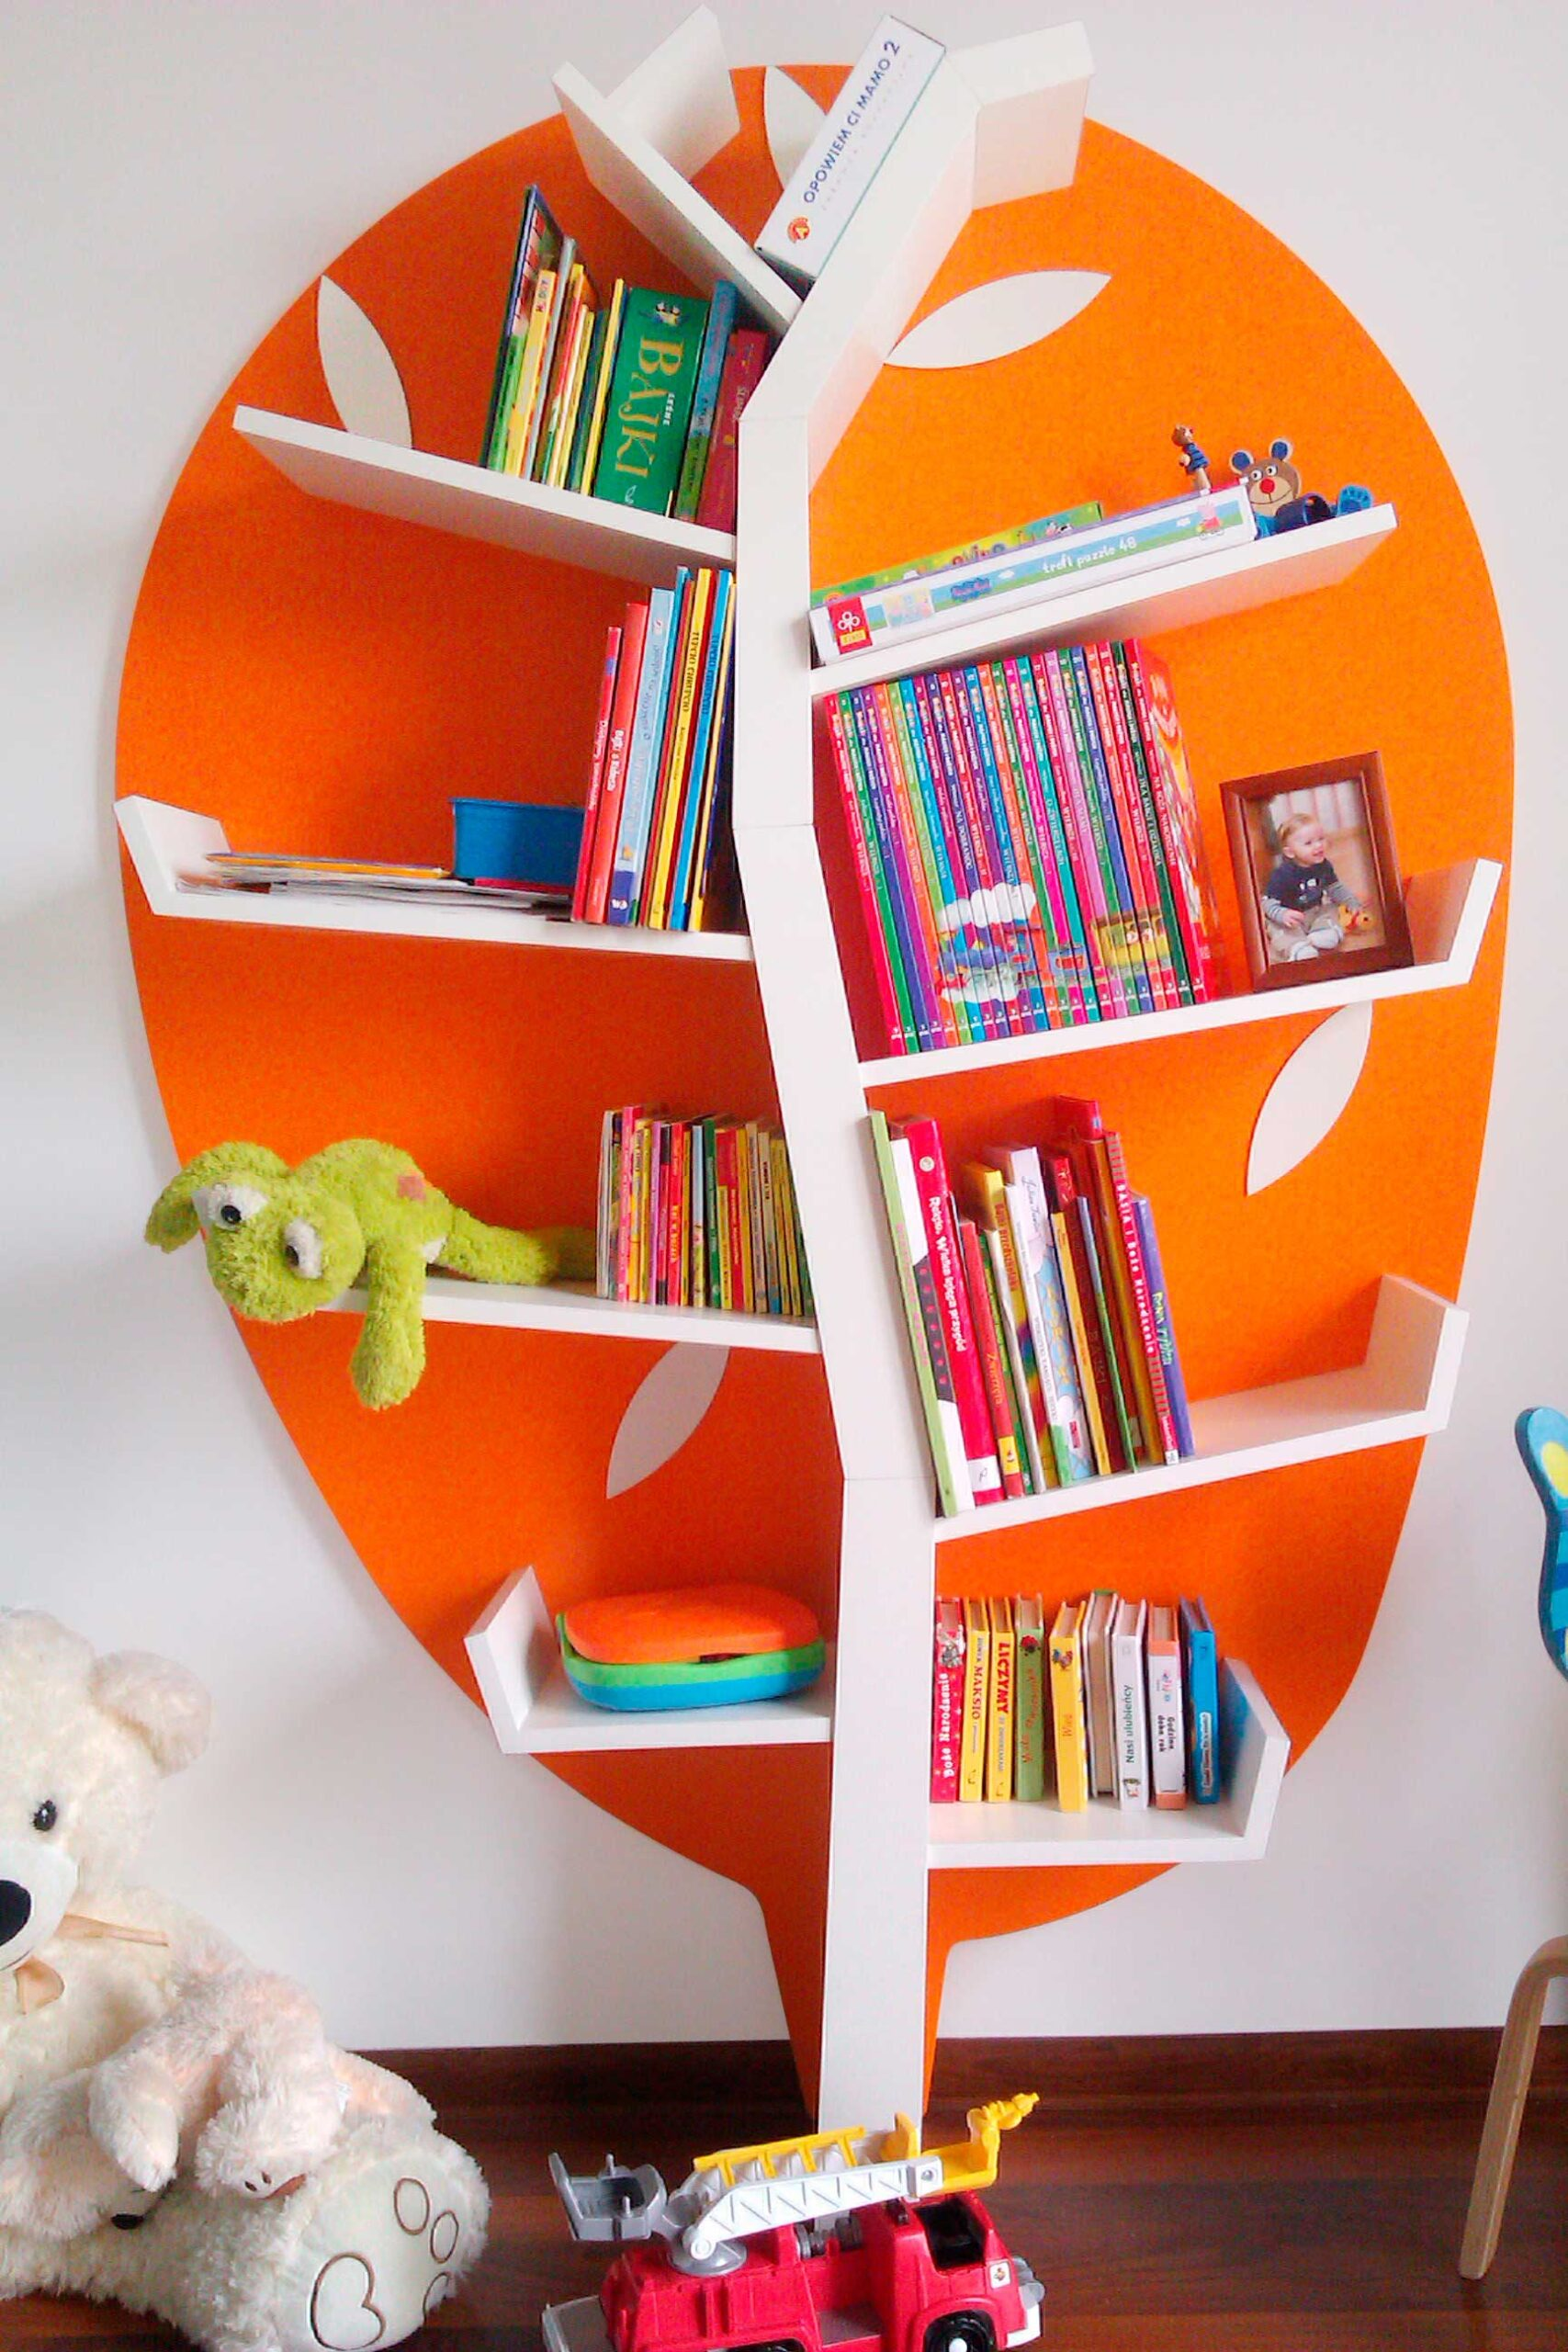 Full Size of Kinderzimmer Bücherregal Regale Regal Weiß Sofa Kinderzimmer Kinderzimmer Bücherregal